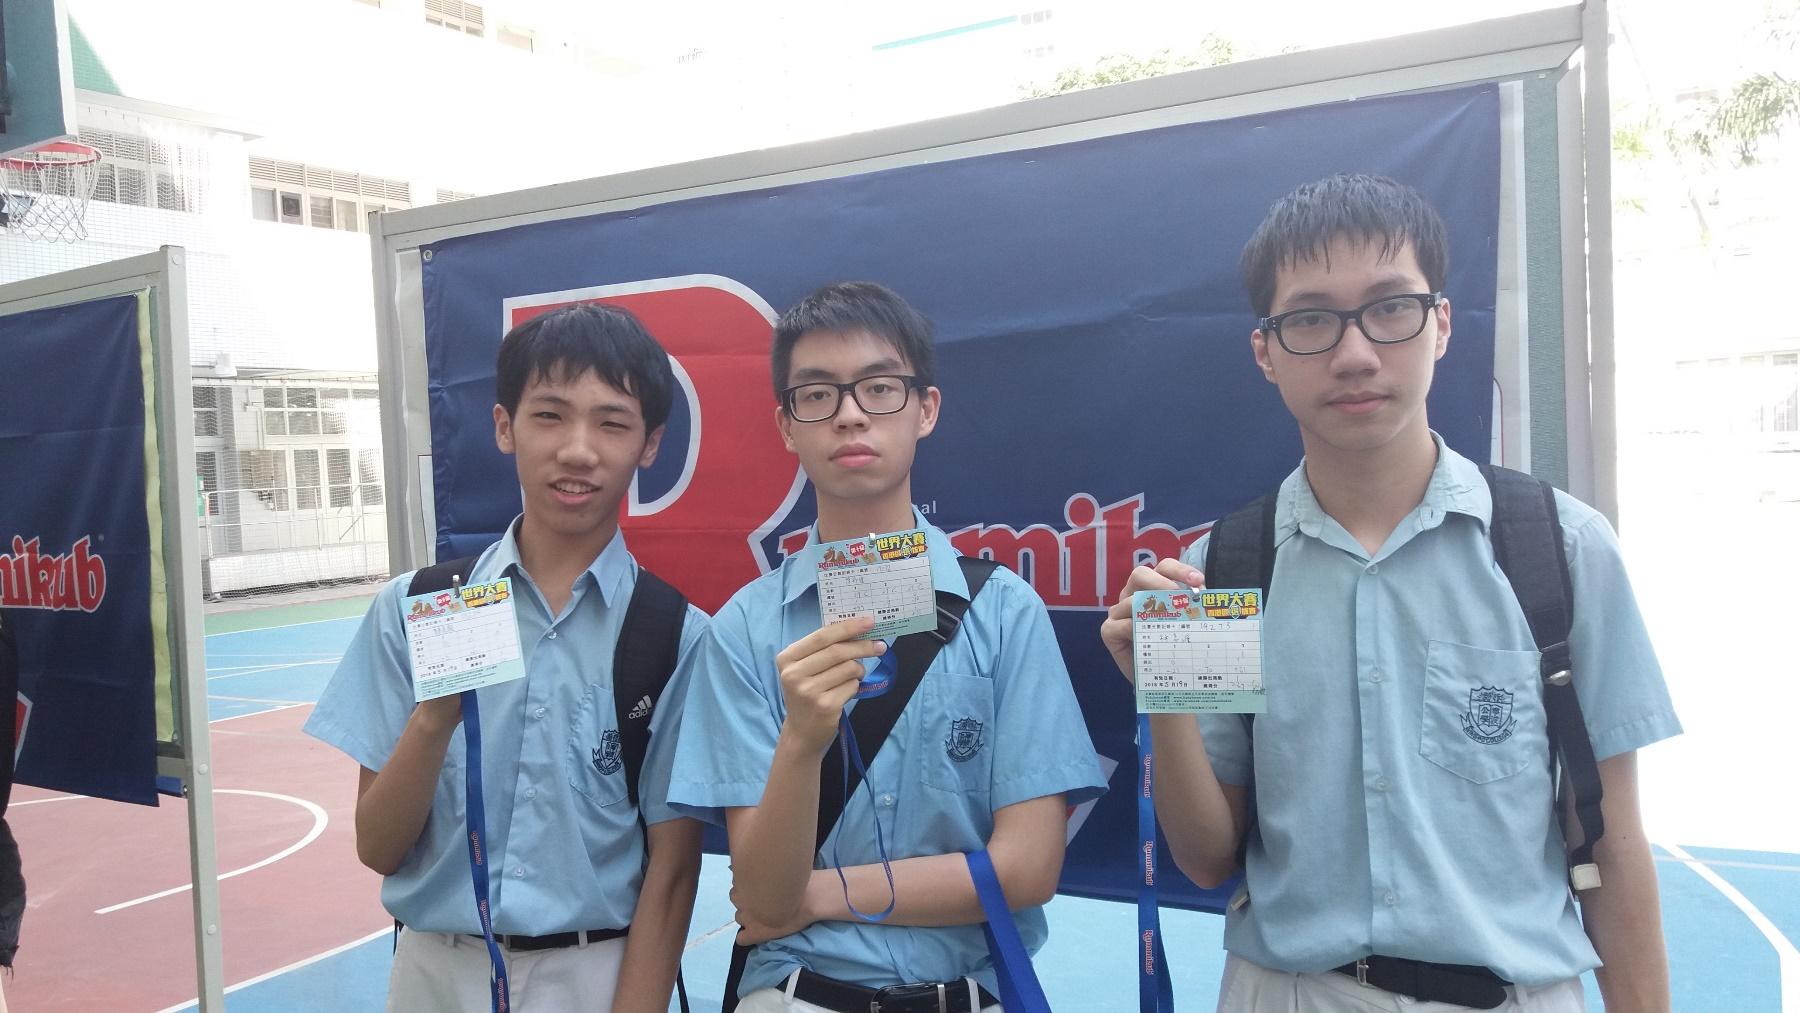 http://npc.edu.hk/sites/default/files/20180519_152208.jpg